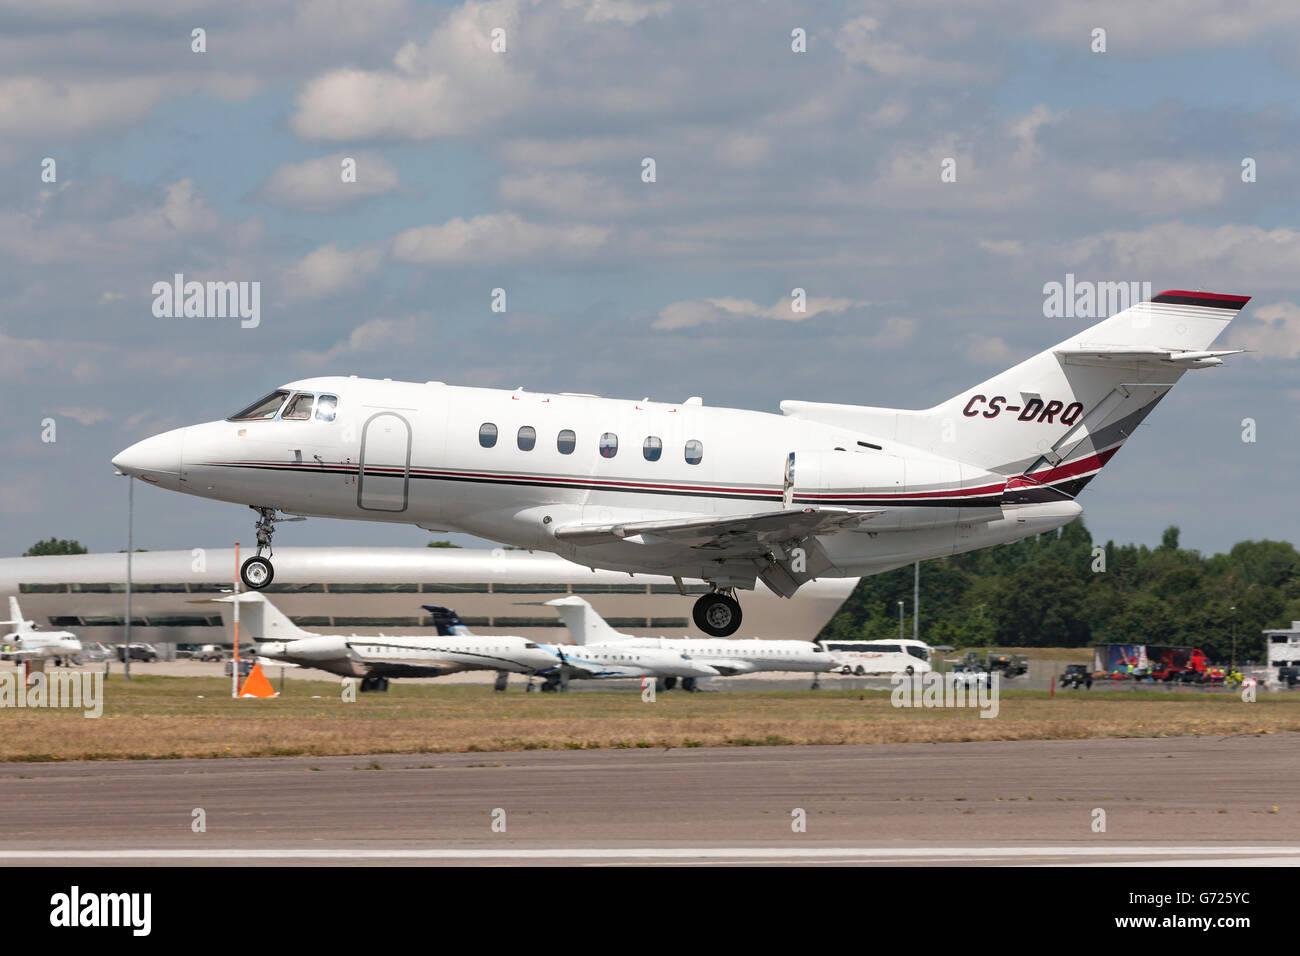 NetJets Raytheon Hawker 800XP private jet CS-DRQ - Stock Image